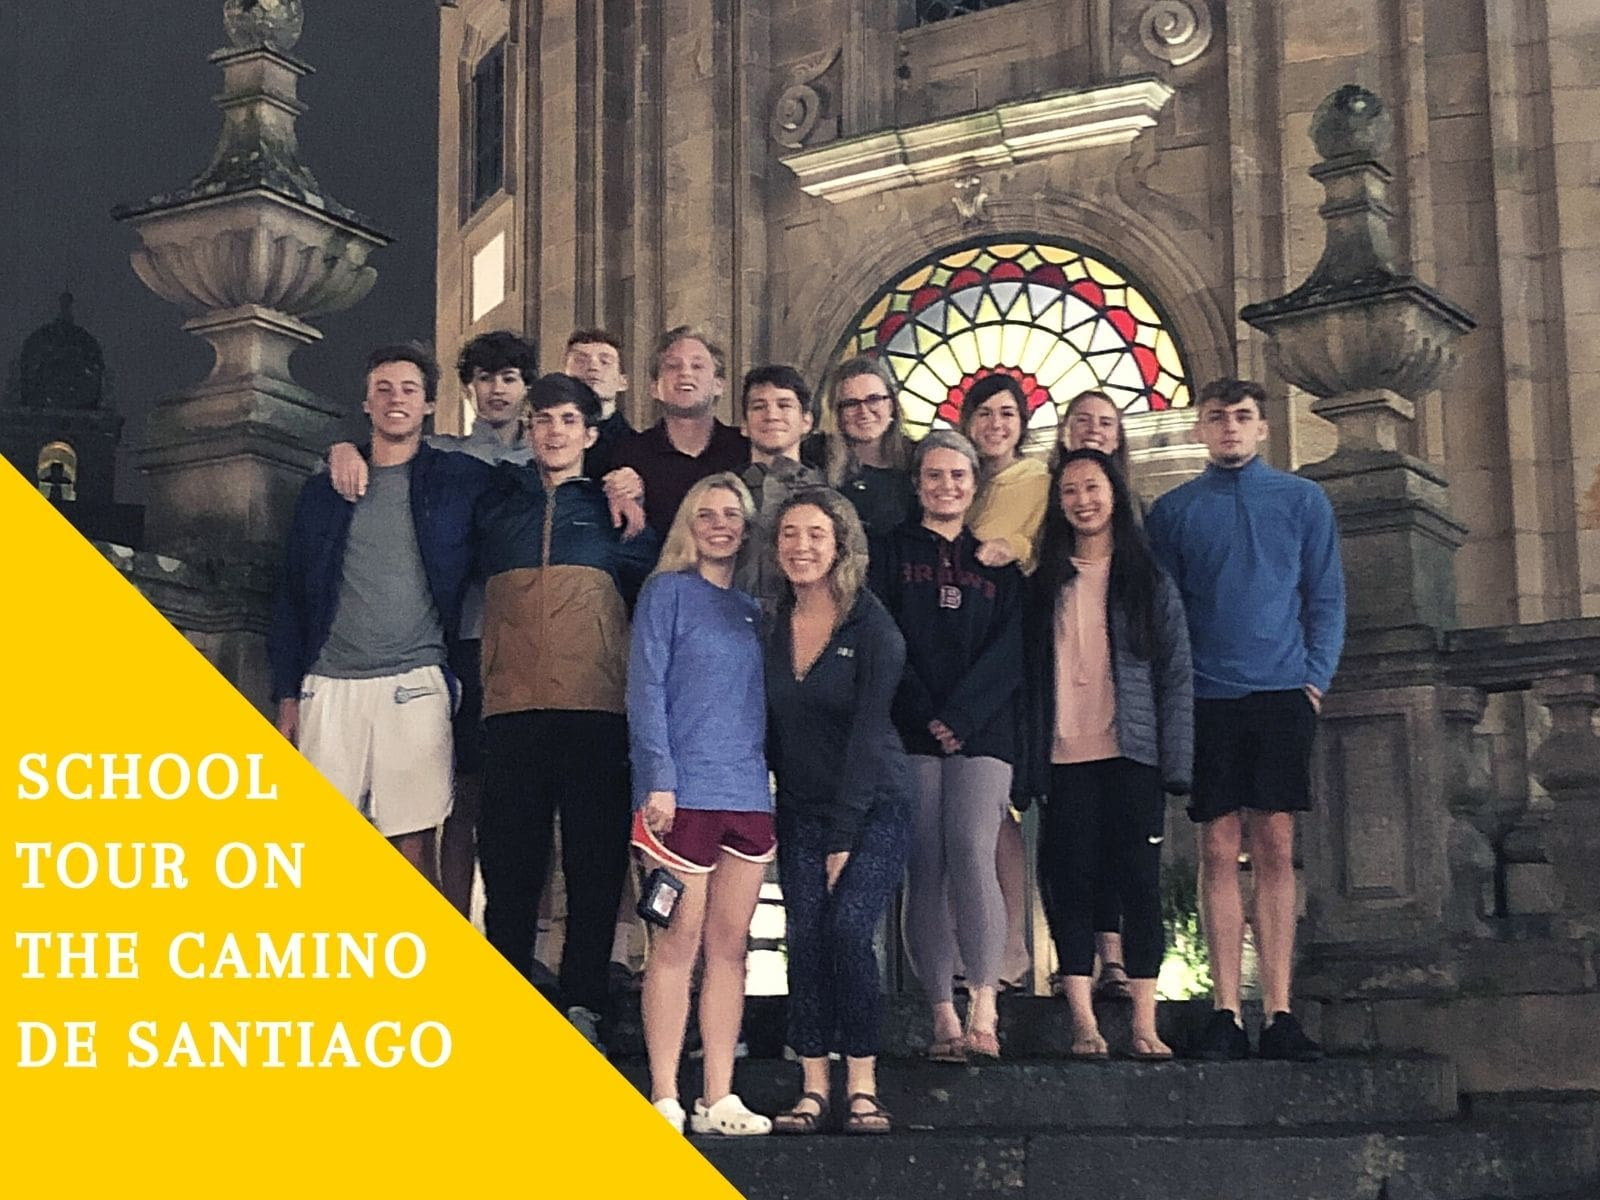 School Tour on the Camino de Santiago